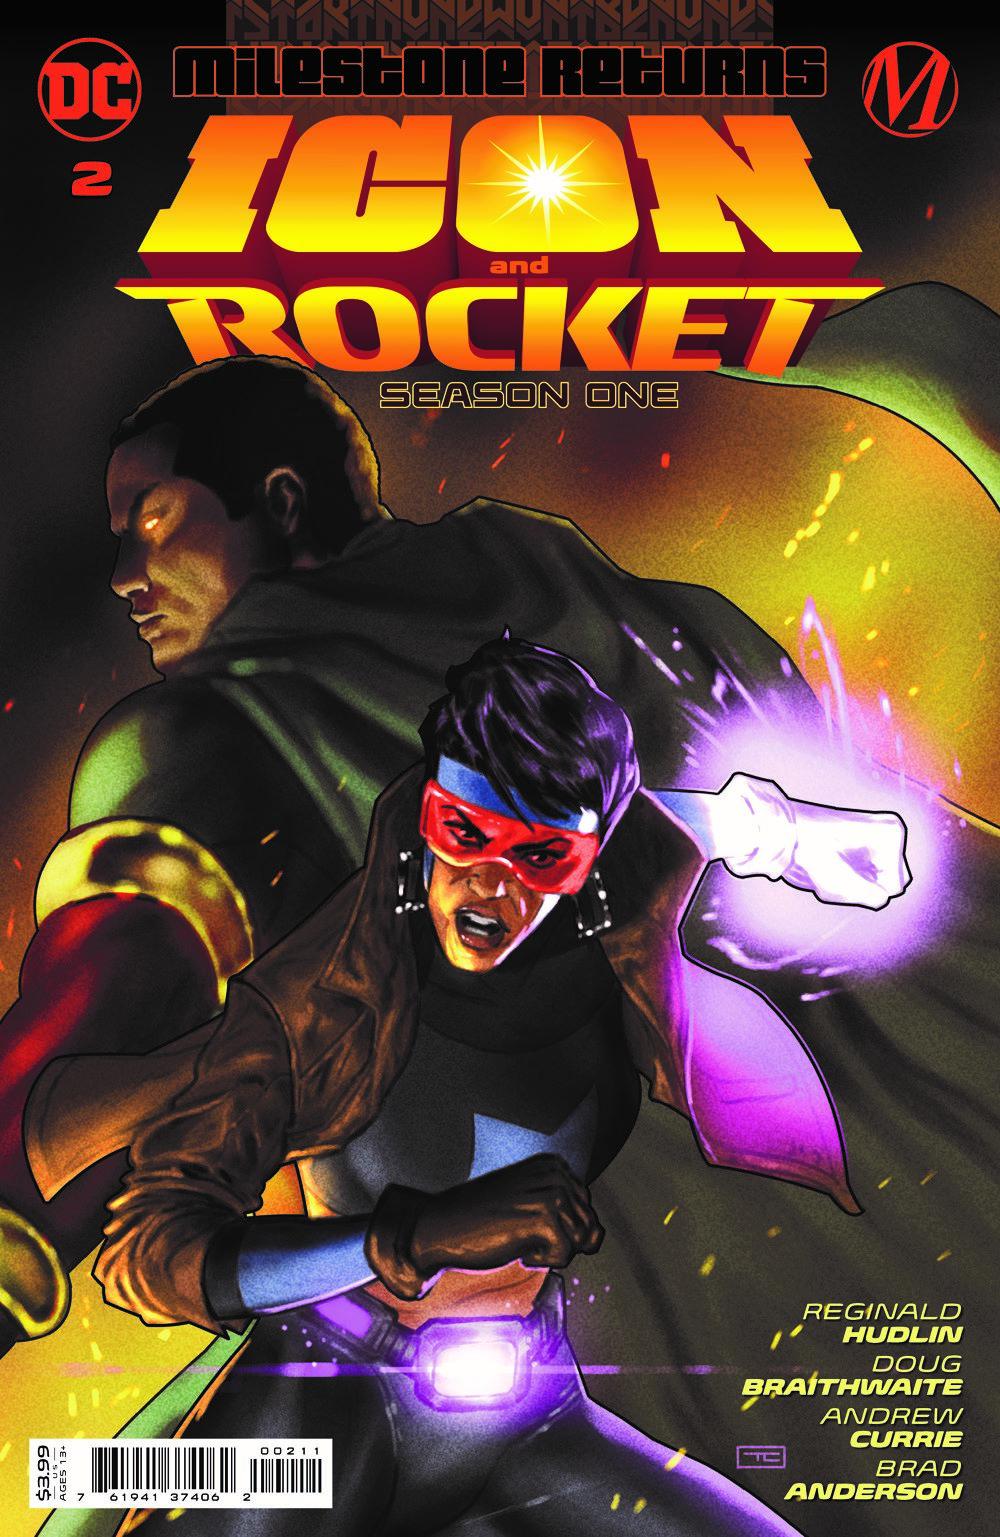 ICON_ROCKET_S1_Cv2 DC Comics August 2021 Solicitations